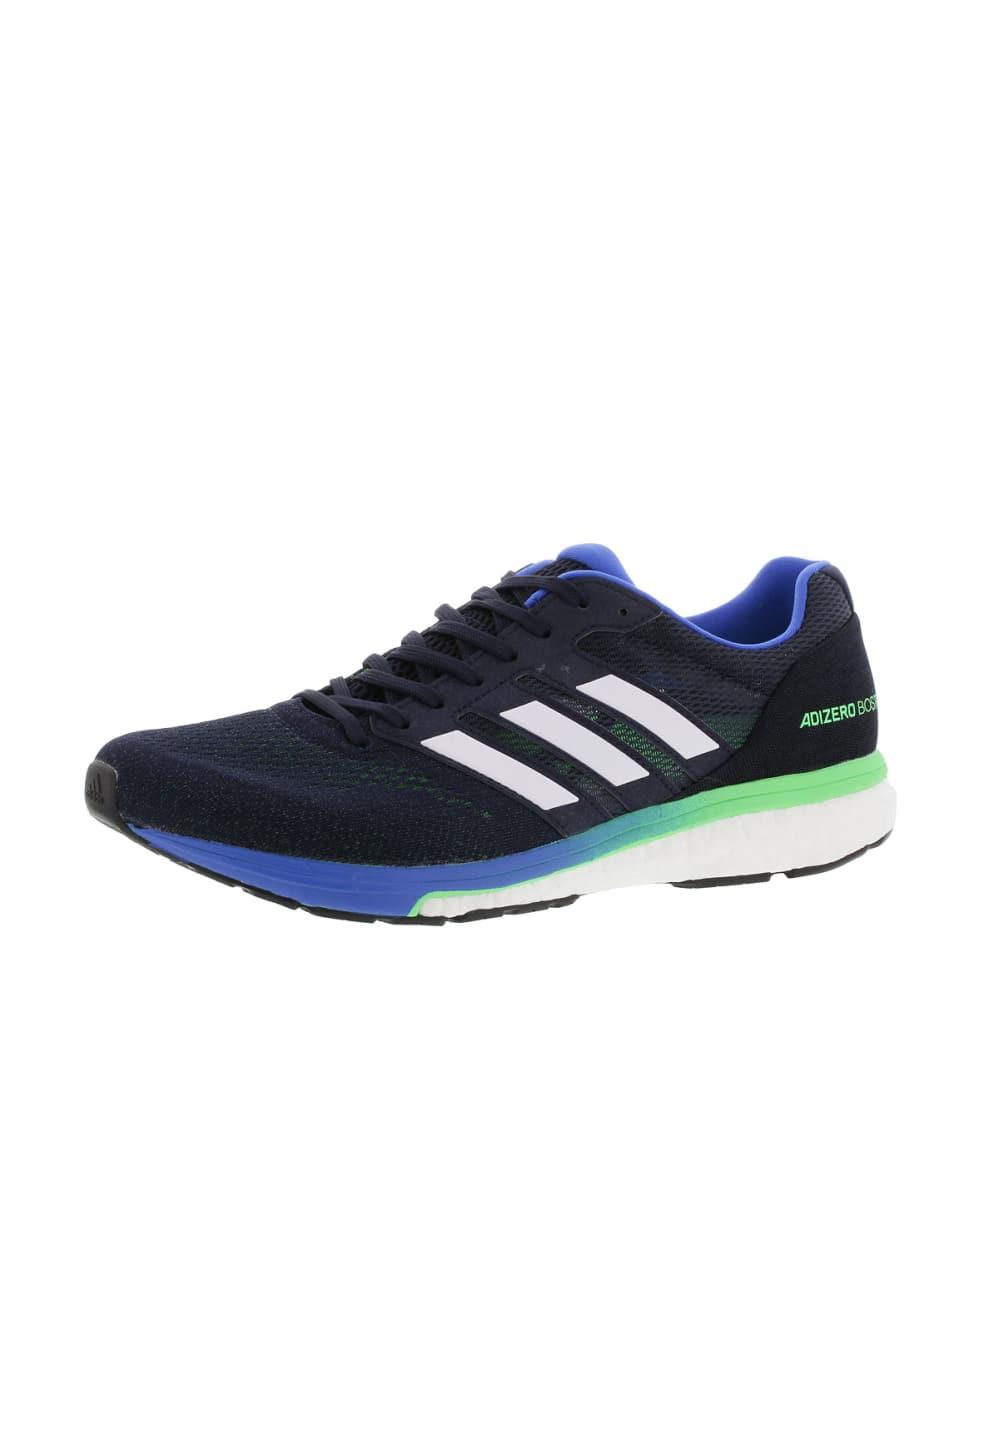 adidas Adizero Boston 7 Chaussures running pour Homme Bleu